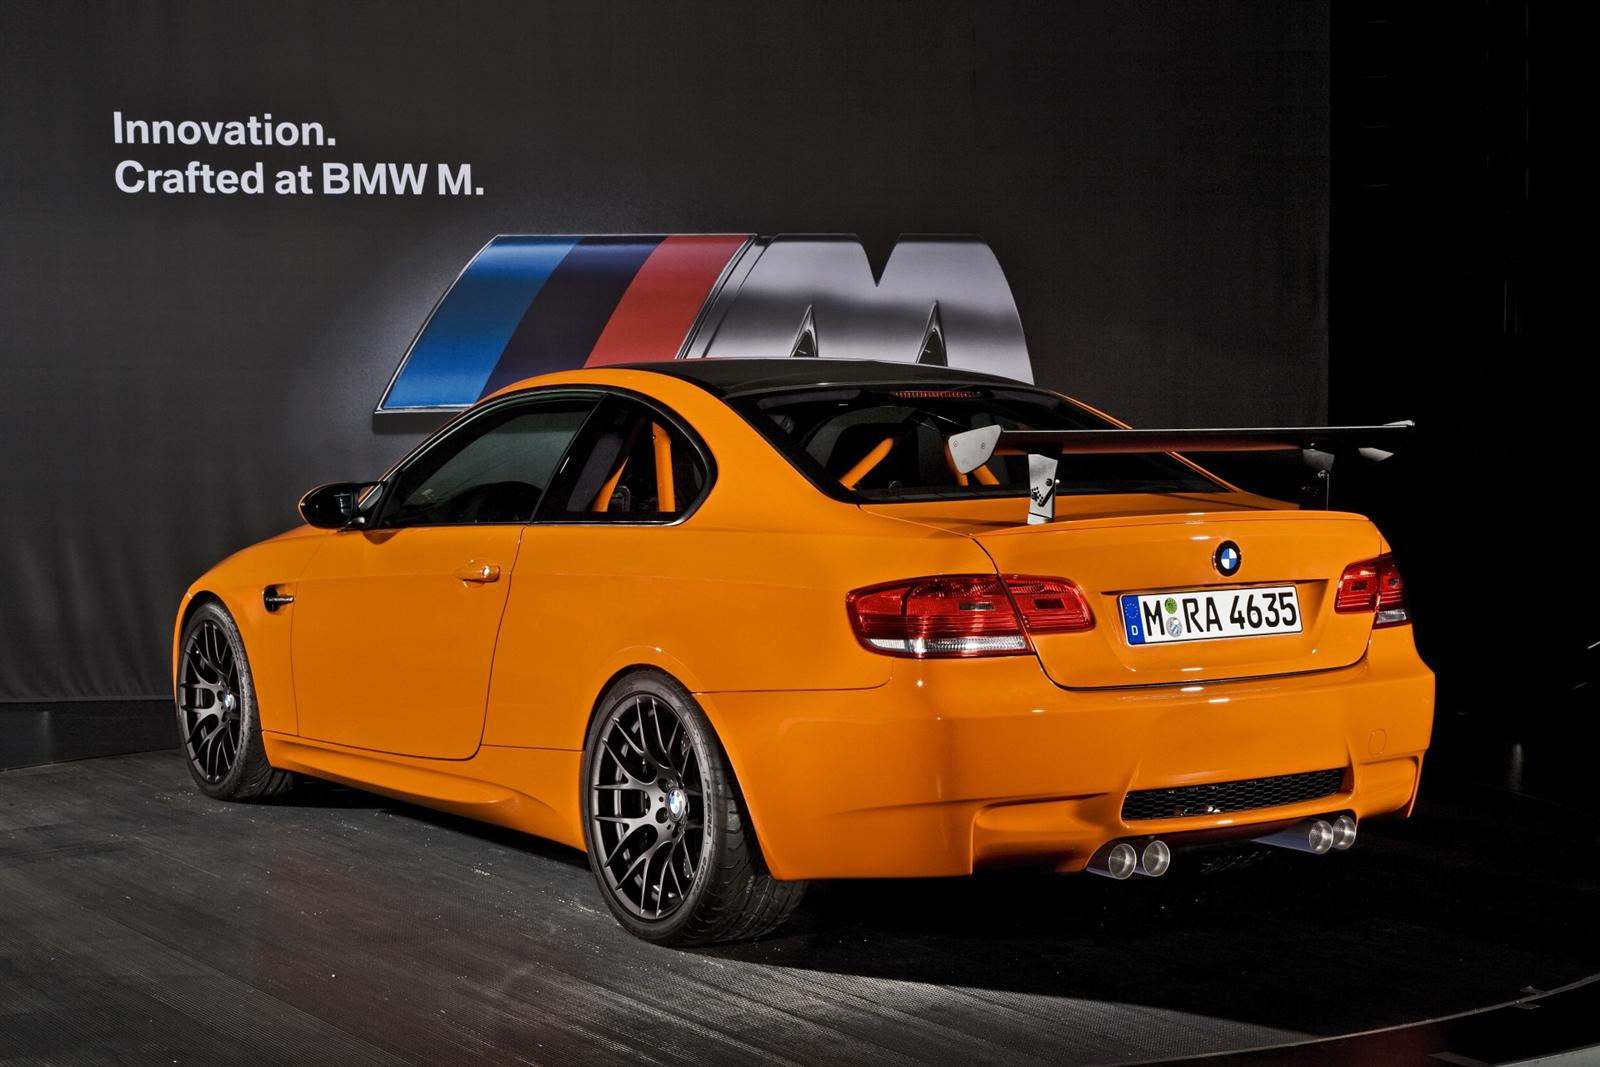 2010 BMW M3 GTS Image